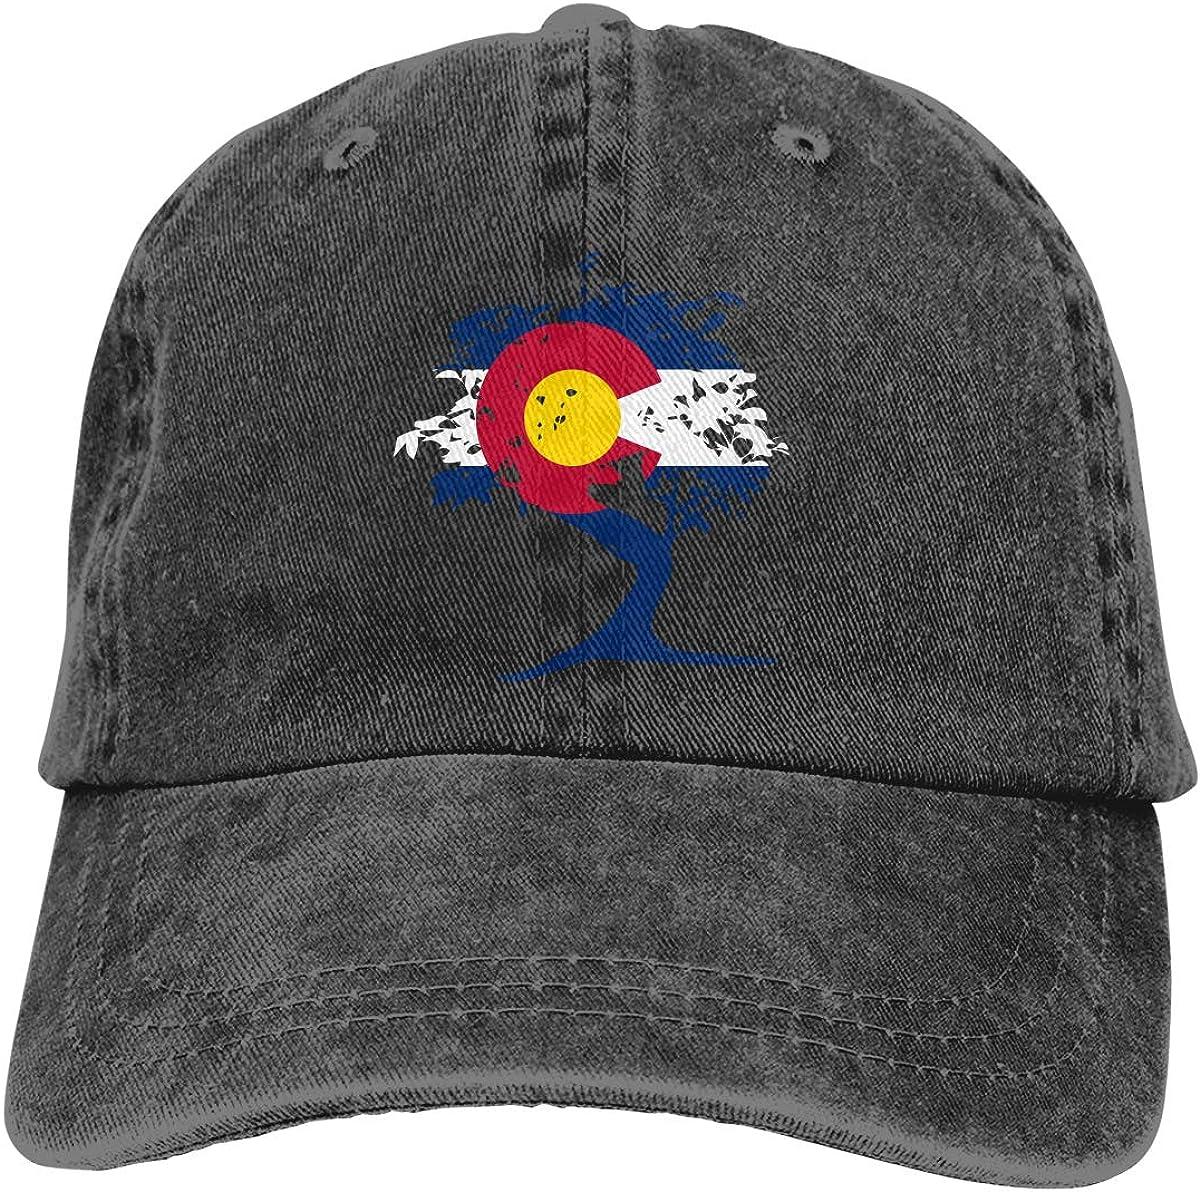 Bonsai Tree Adult Custom Cowboy Sun Hat Adjustable Baseball Cap